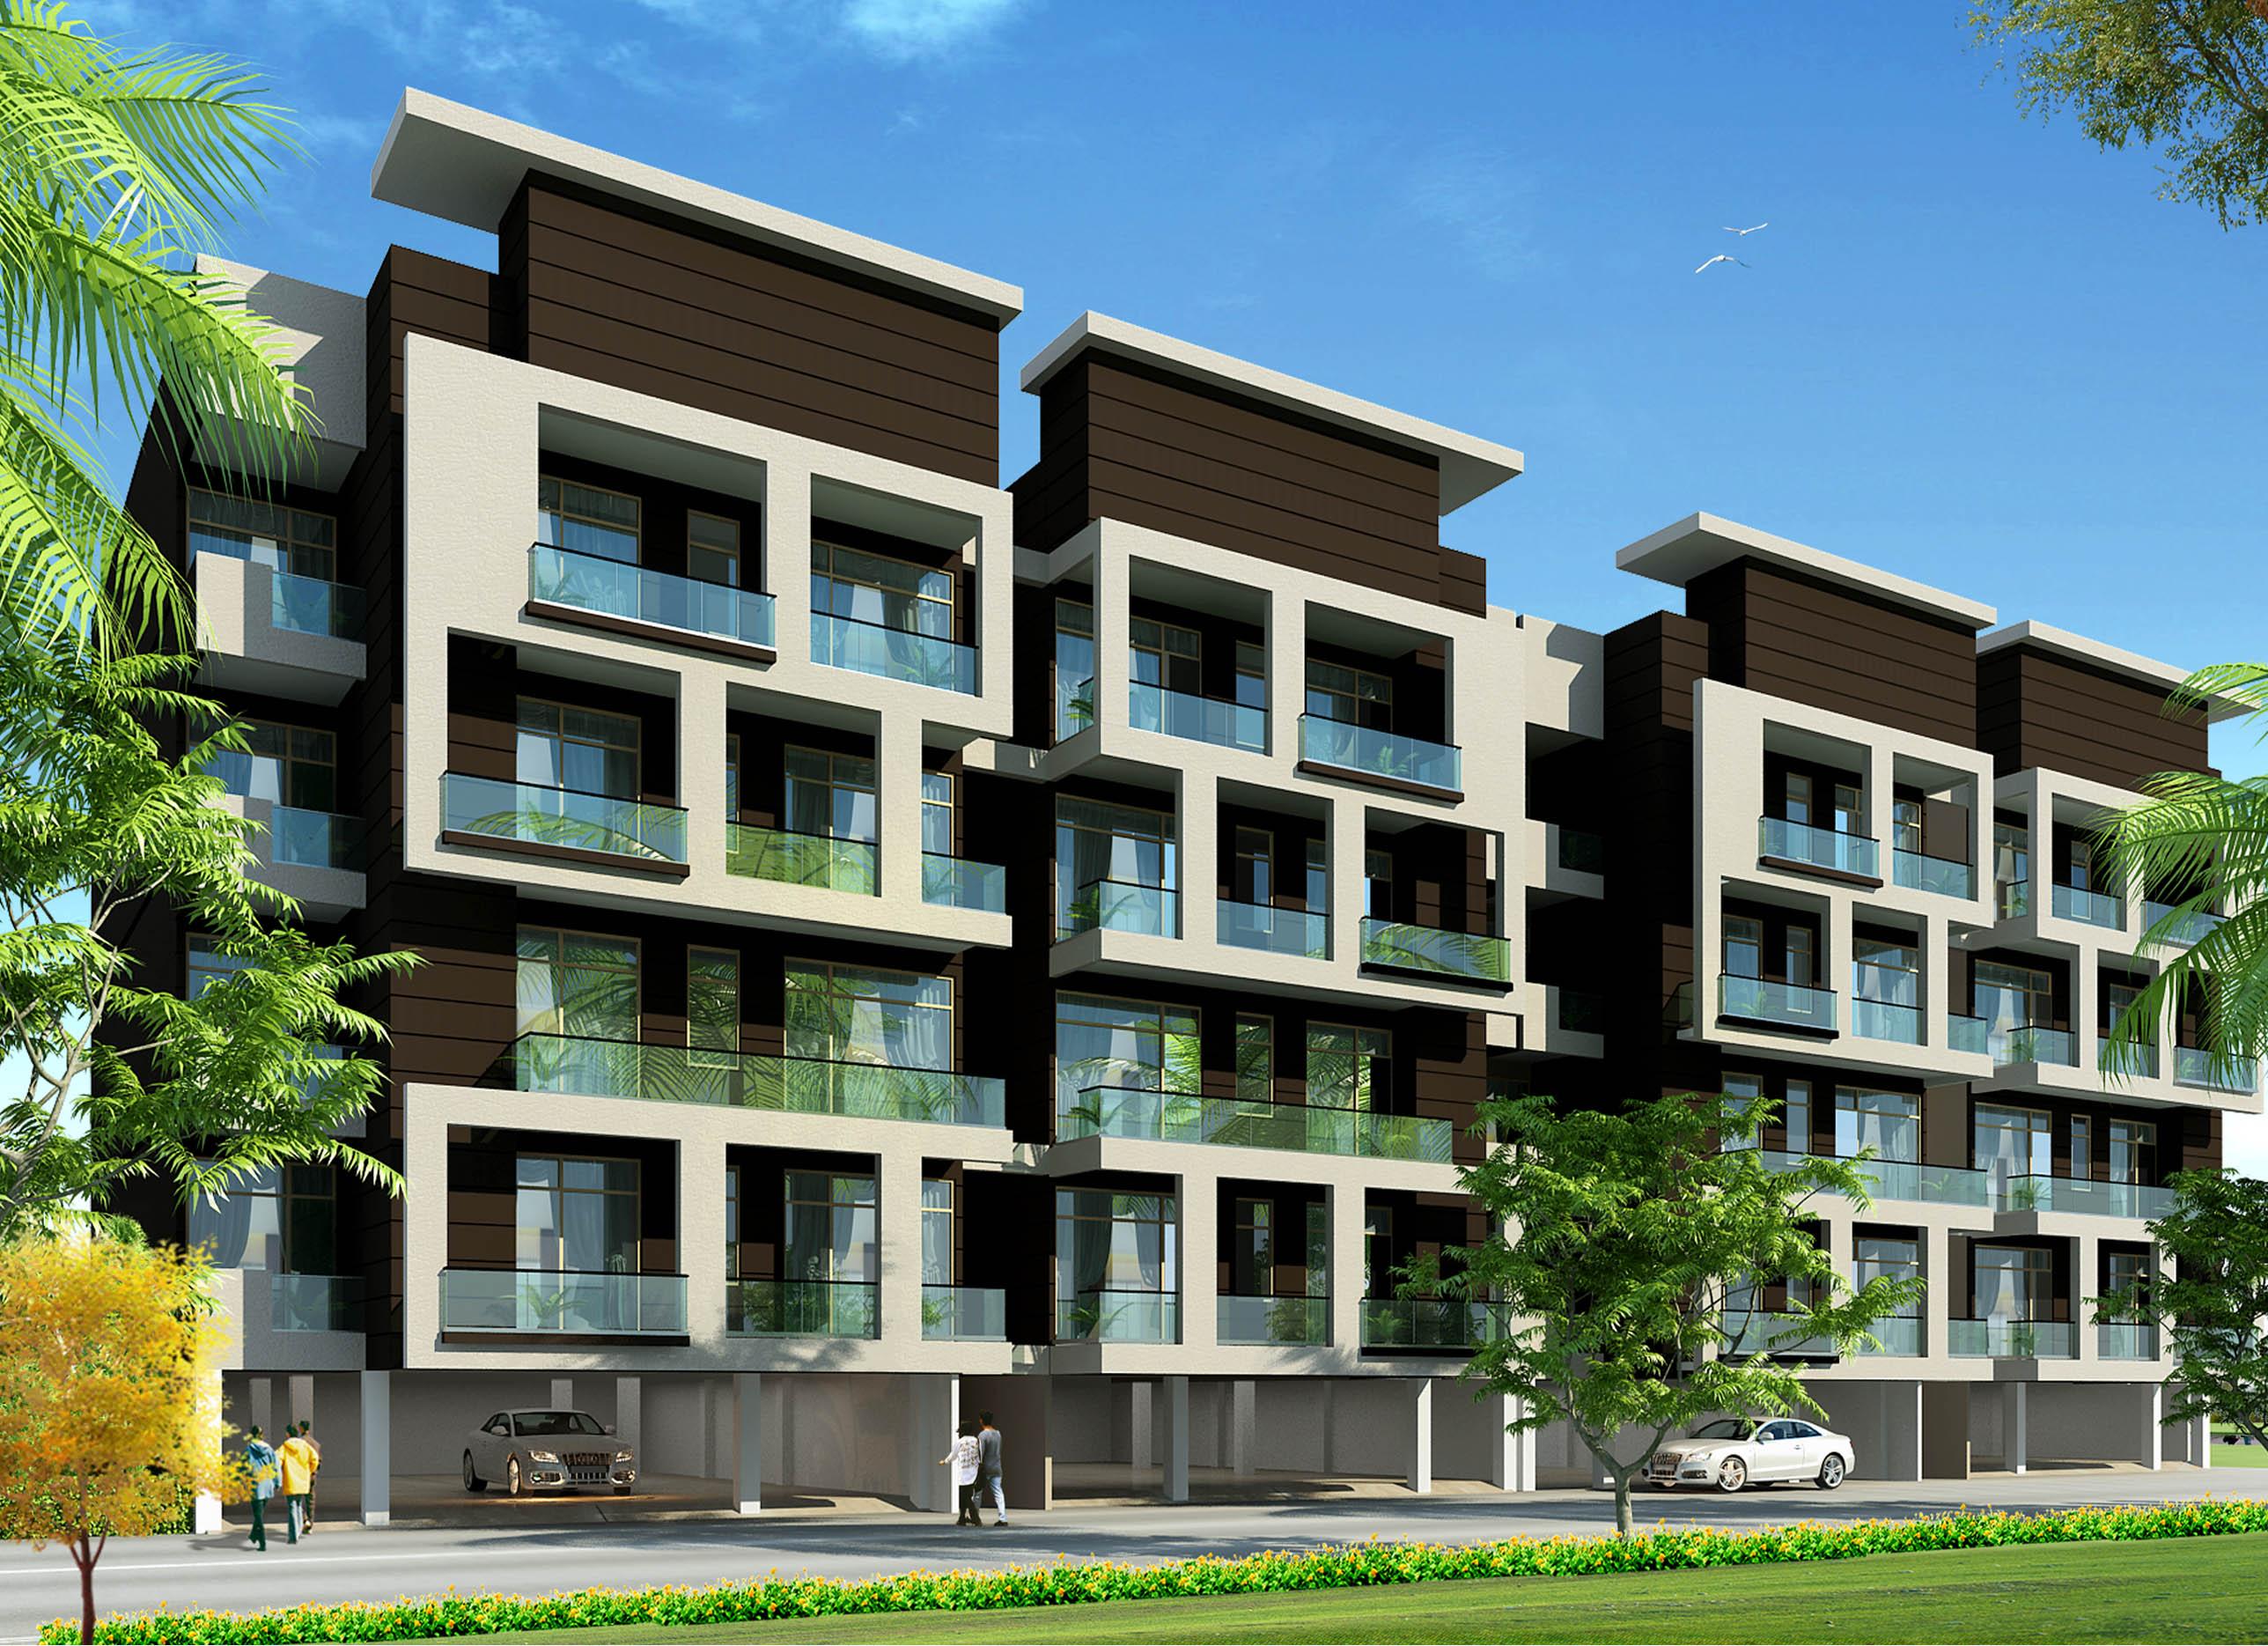 Home designer professional for Professional home designer